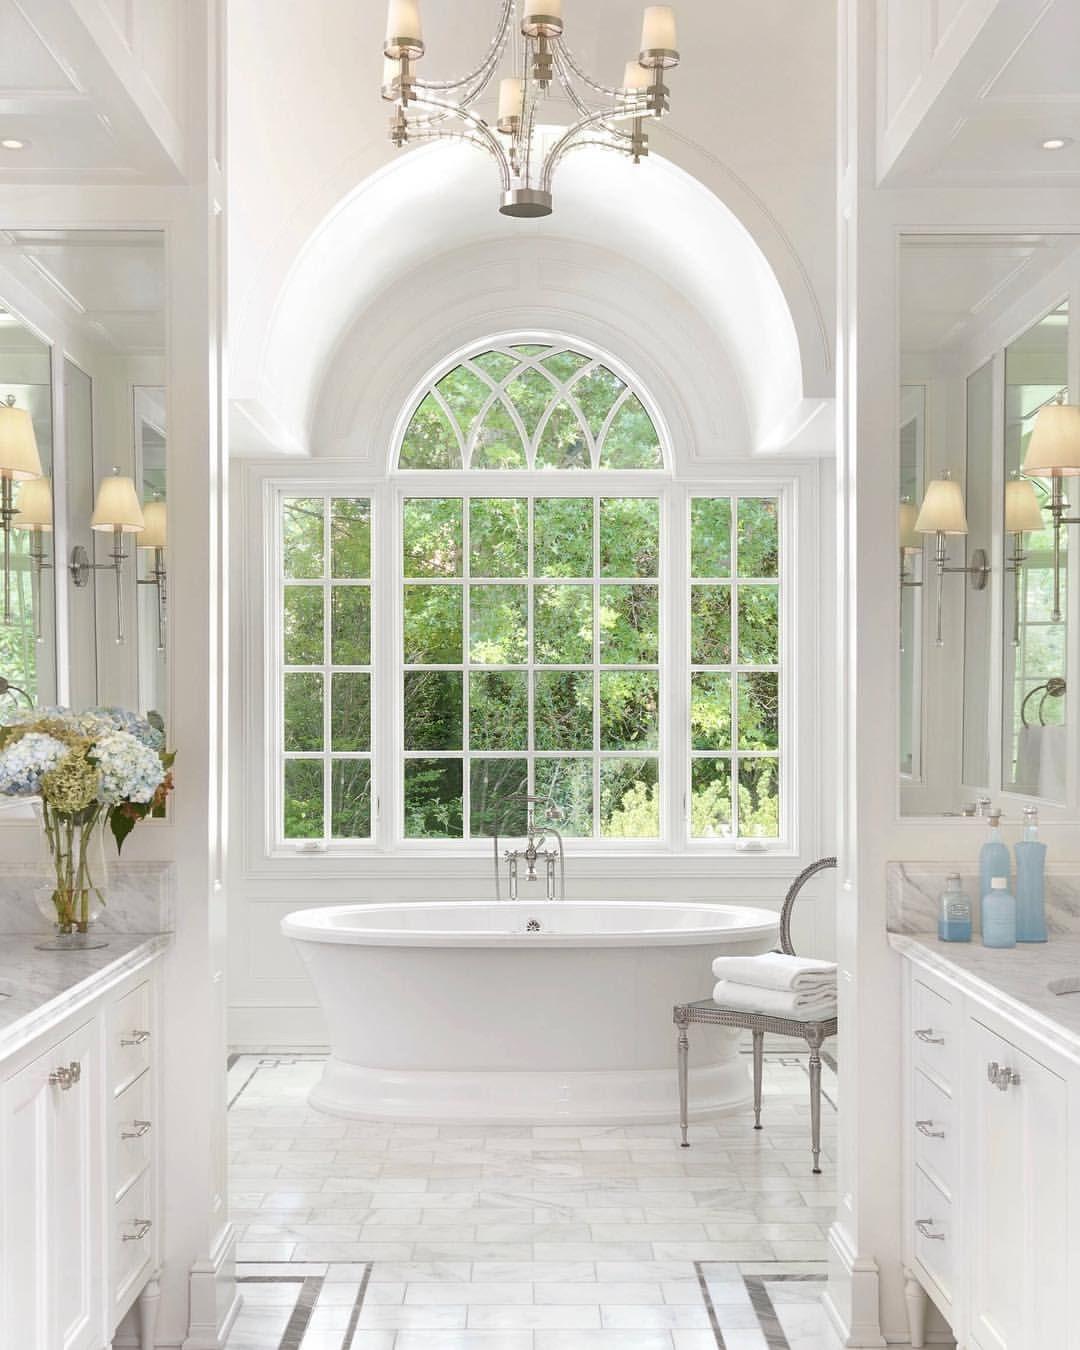 Luxurybathroomdesigns Luxury Bathroom Master Baths Dream Bathrooms Bathrooms Remodel